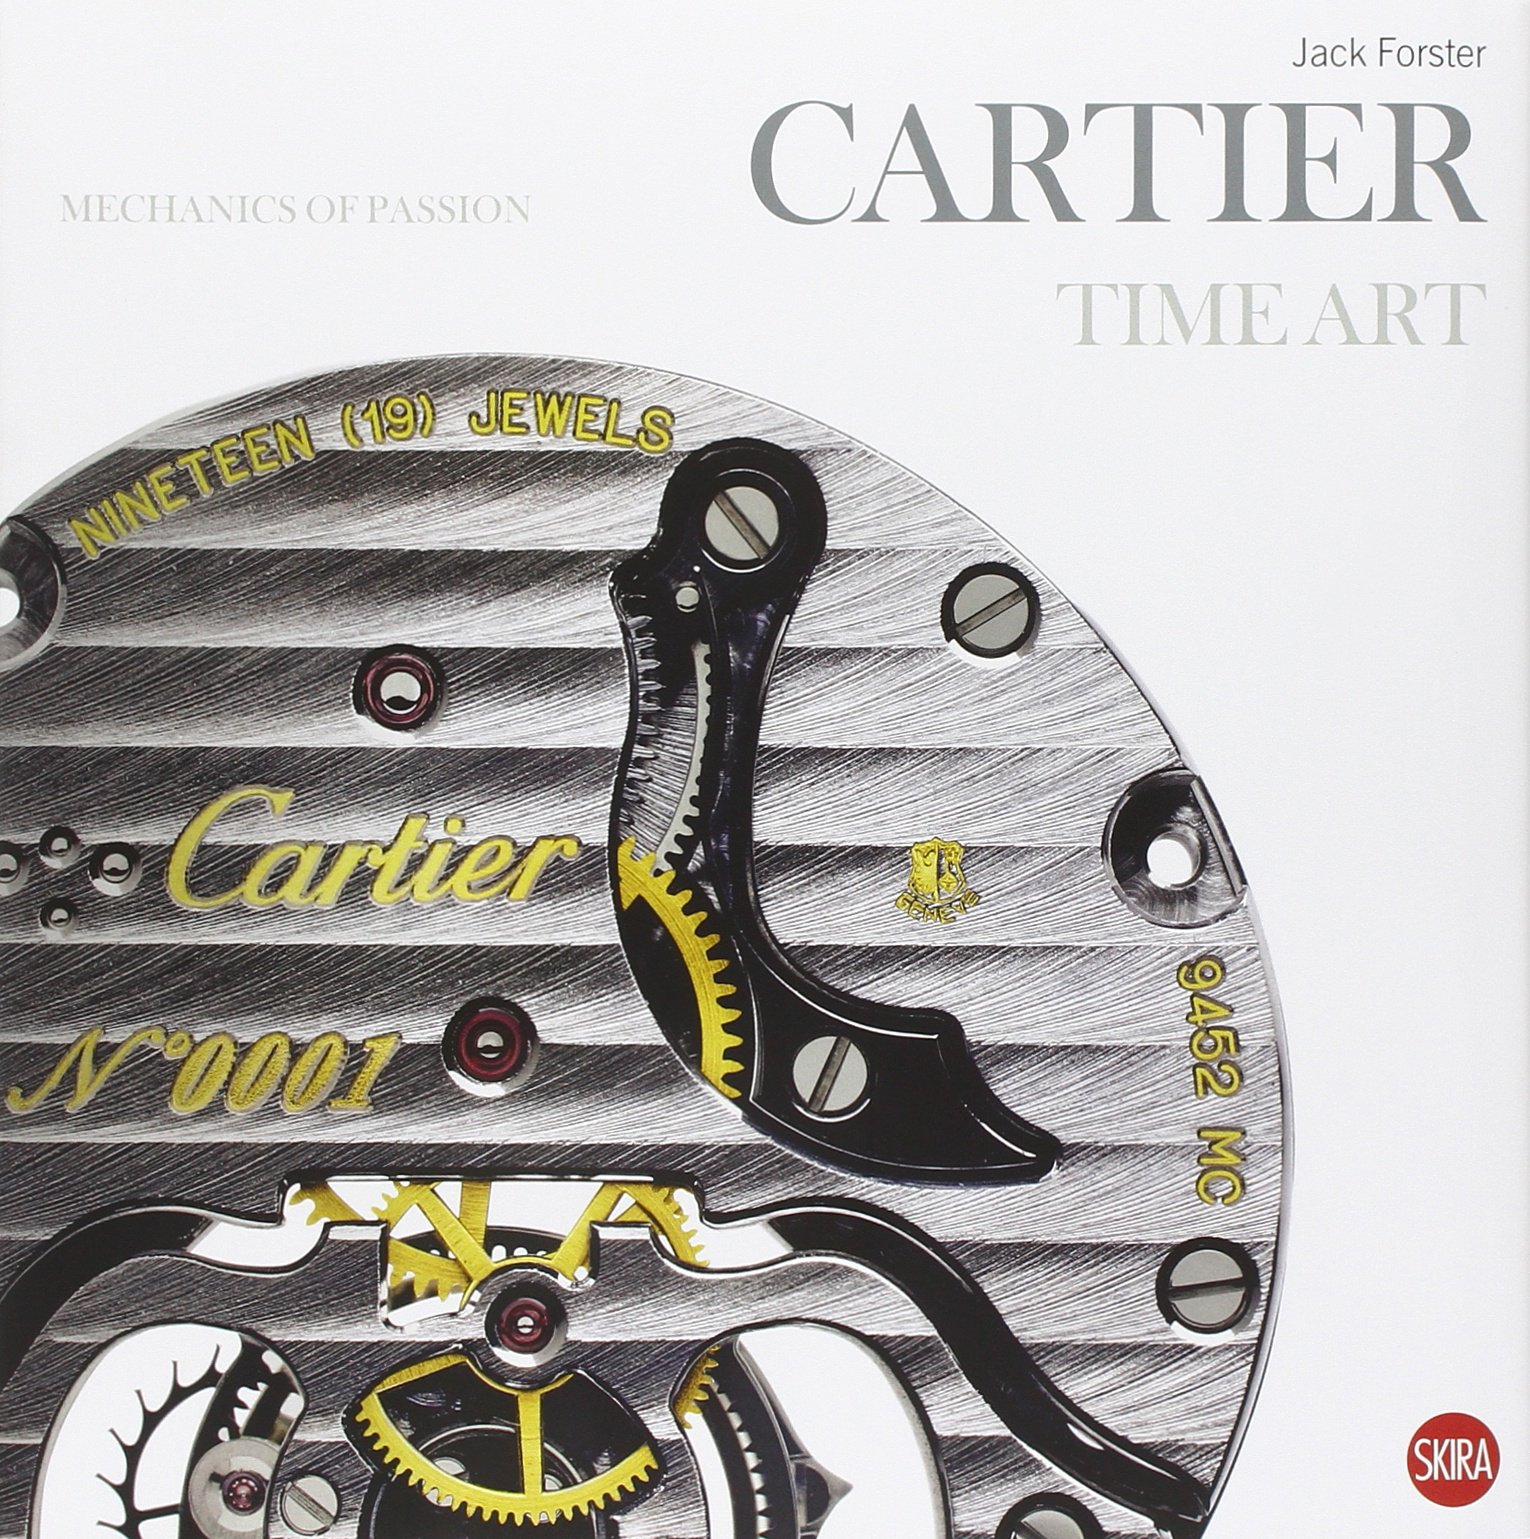 Cartier Time Art: Mechanics of Passion PDF